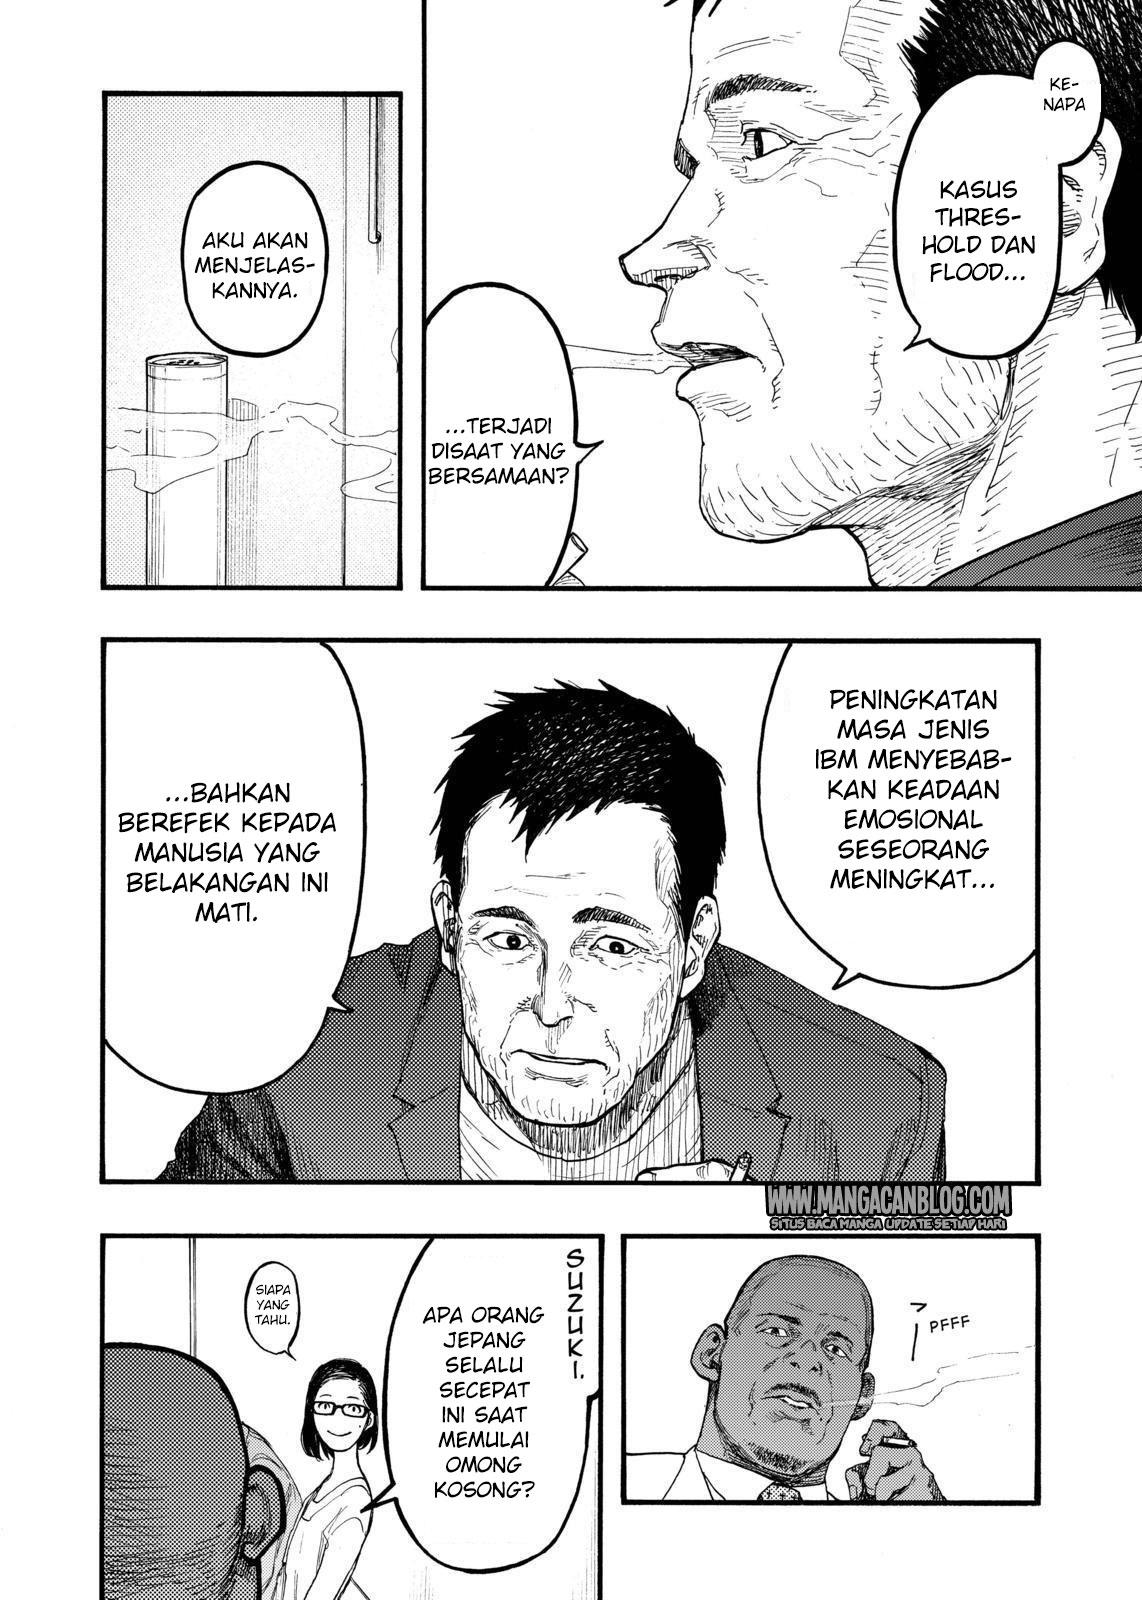 Dilarang COPAS - situs resmi www.mangacanblog.com - Komik ajin 046 - selamat pagi, sampai jumpa besok 47 Indonesia ajin 046 - selamat pagi, sampai jumpa besok Terbaru 26|Baca Manga Komik Indonesia|Mangacan